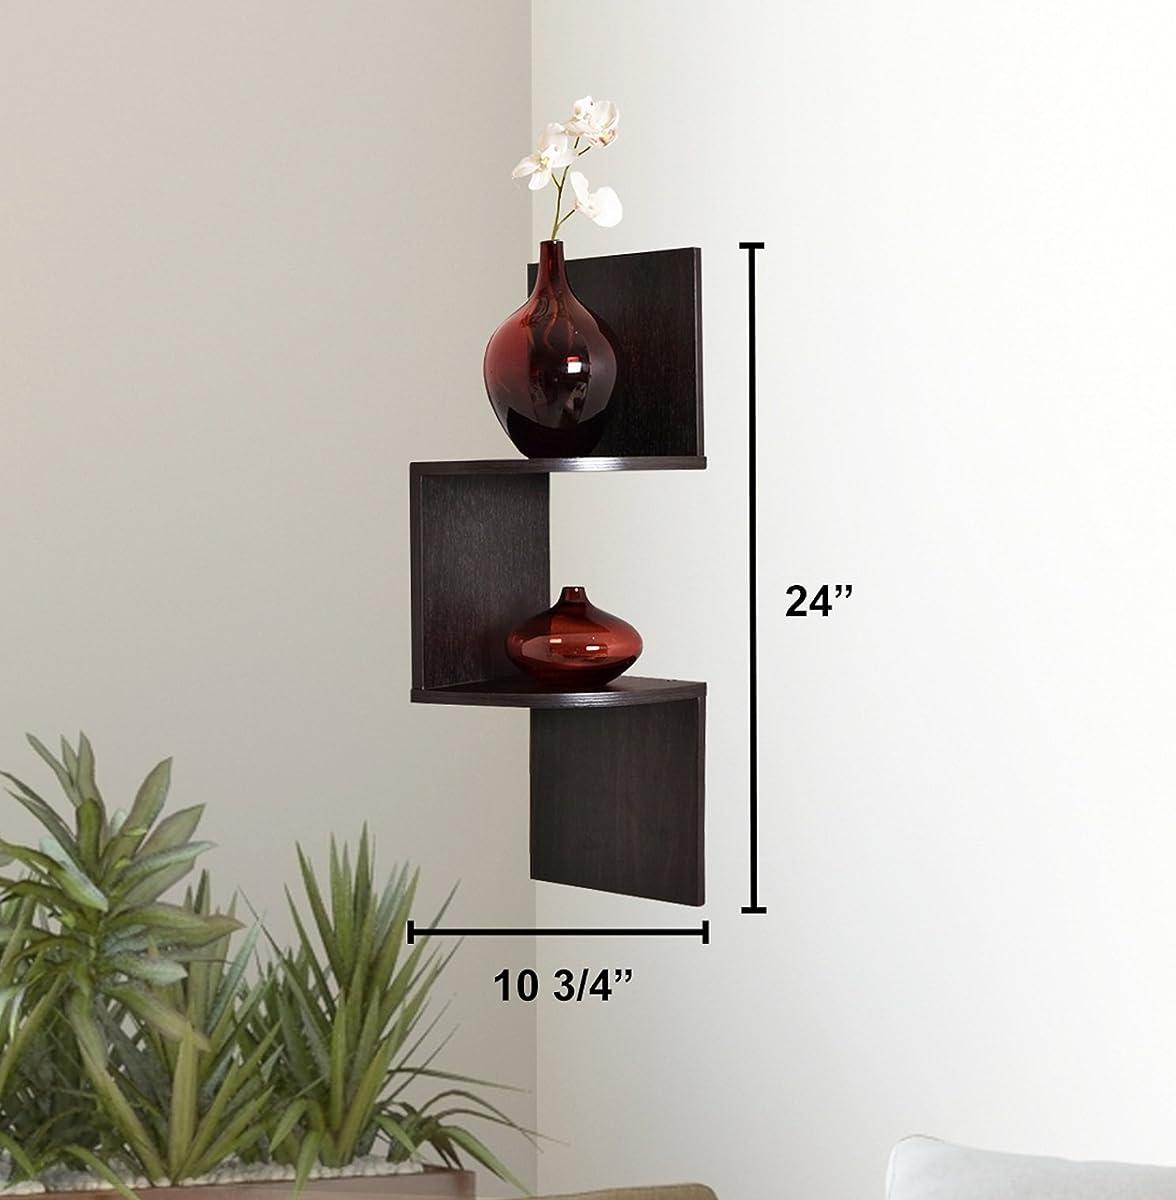 Greenco Zigzag 2 Tier Corner Floating Shelves, Espresso.